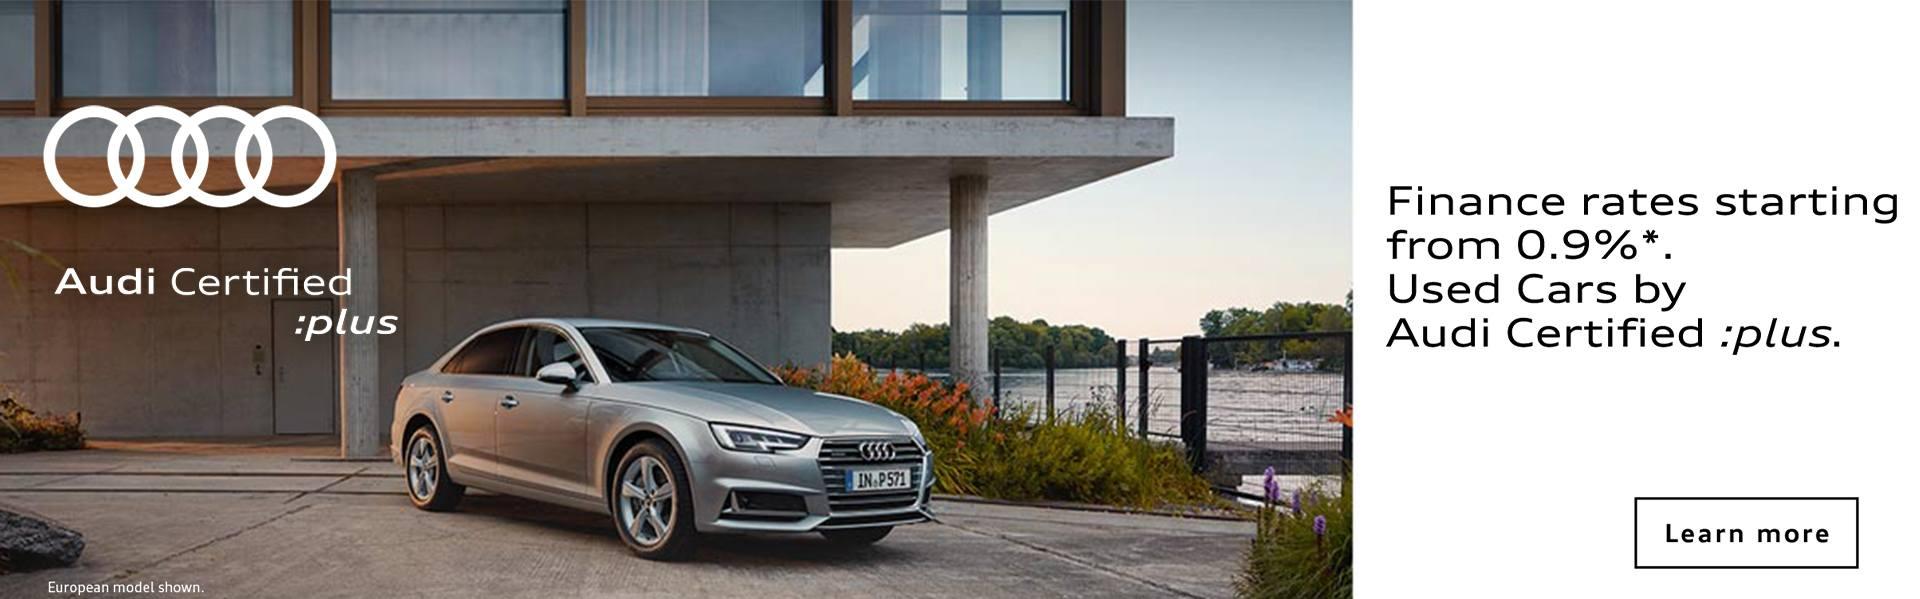 Audi Certified :Plus offer